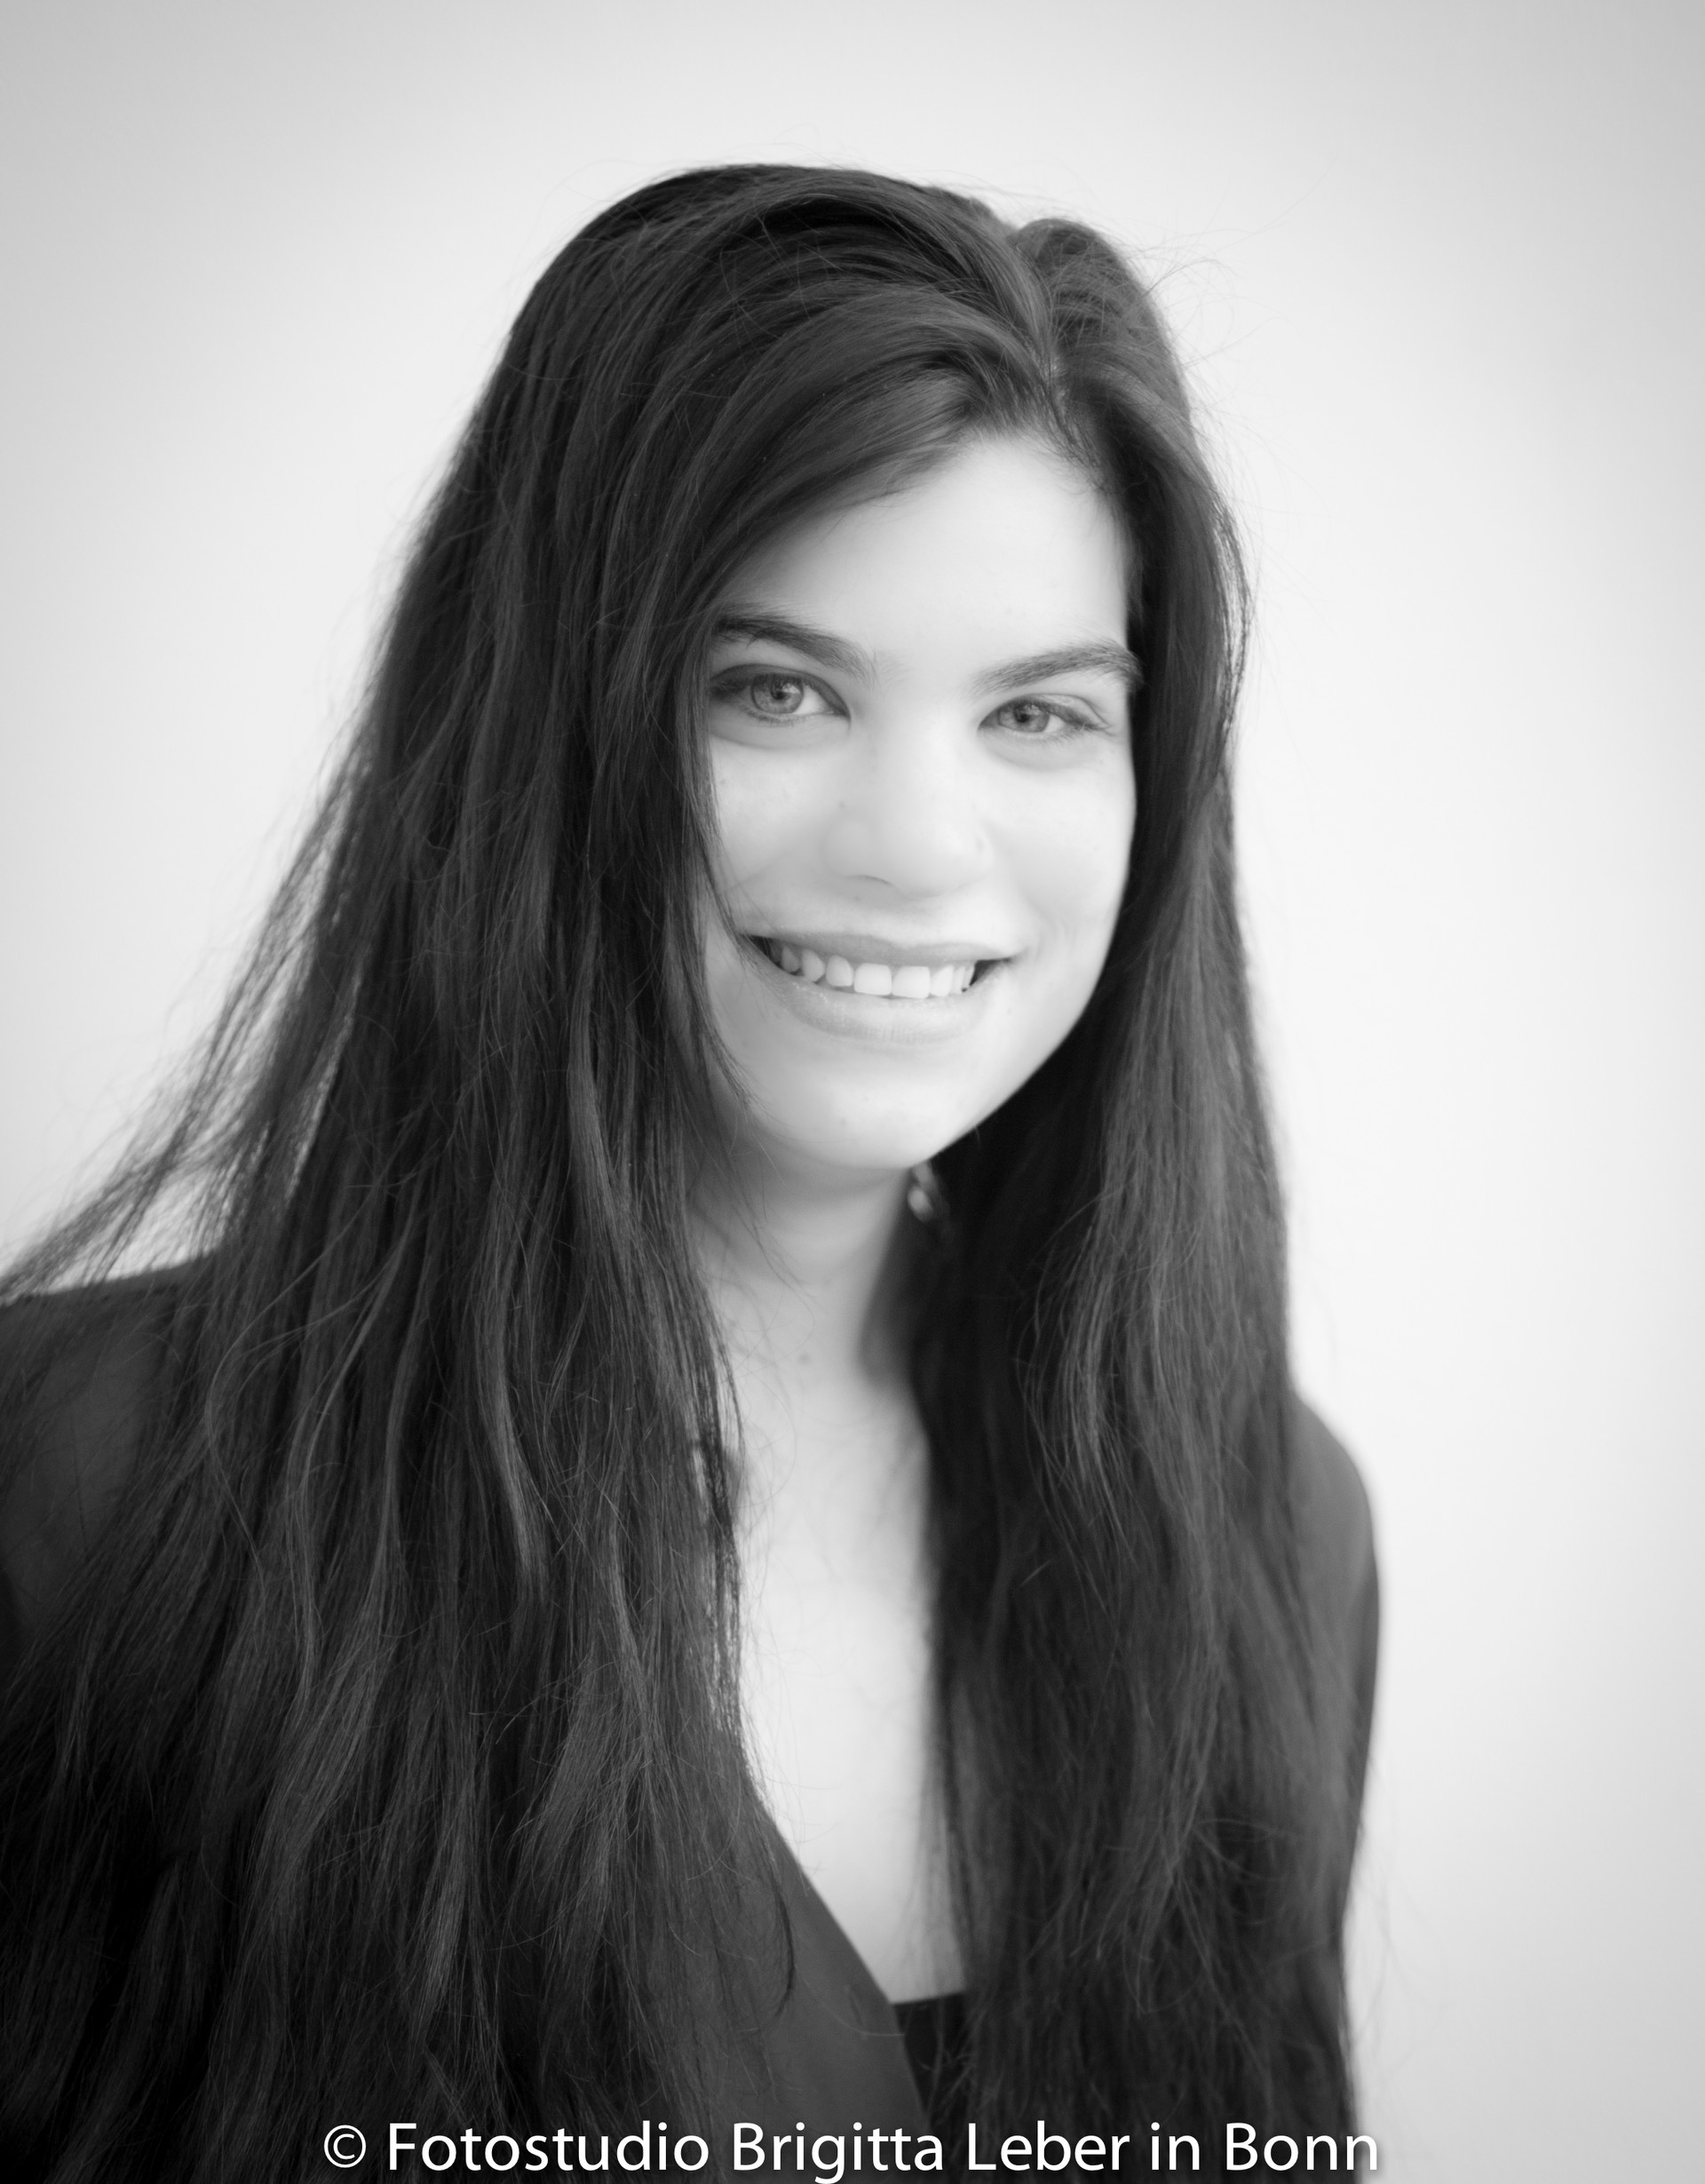 Portrait _ Fotostudio Brigitta Leber